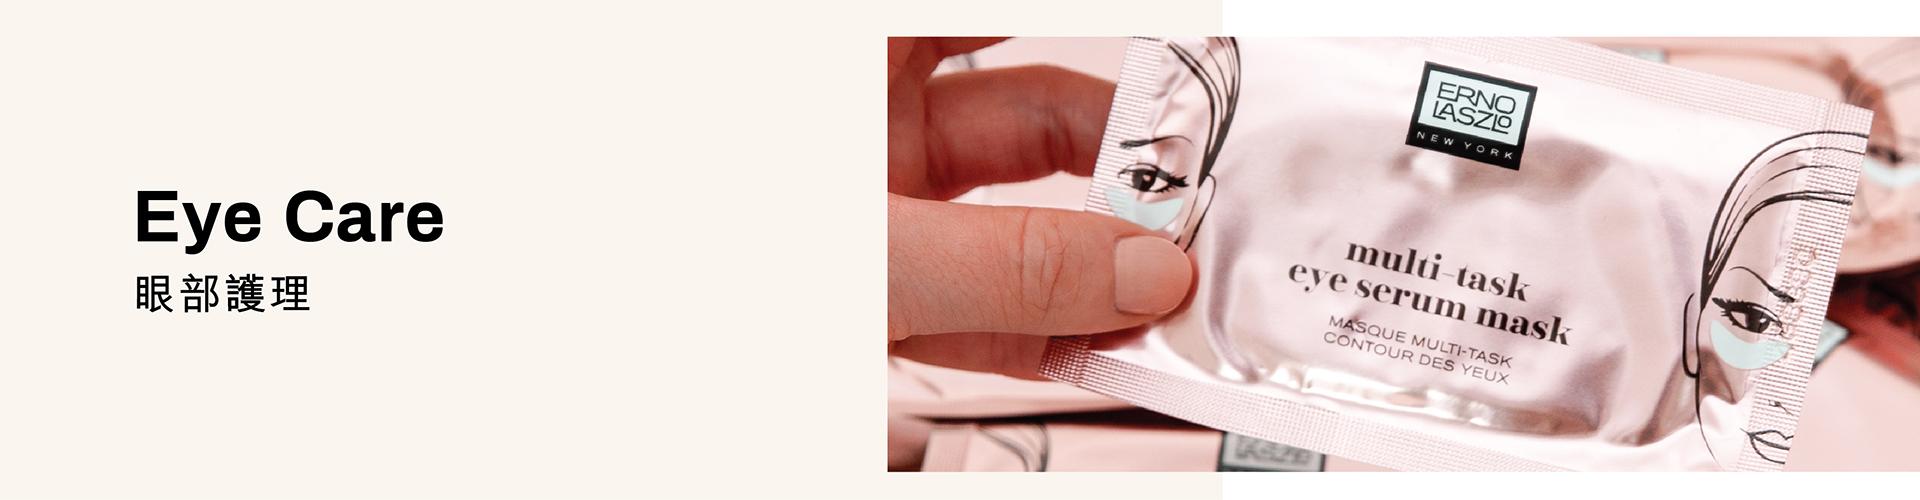 Eye Care 眼部護理